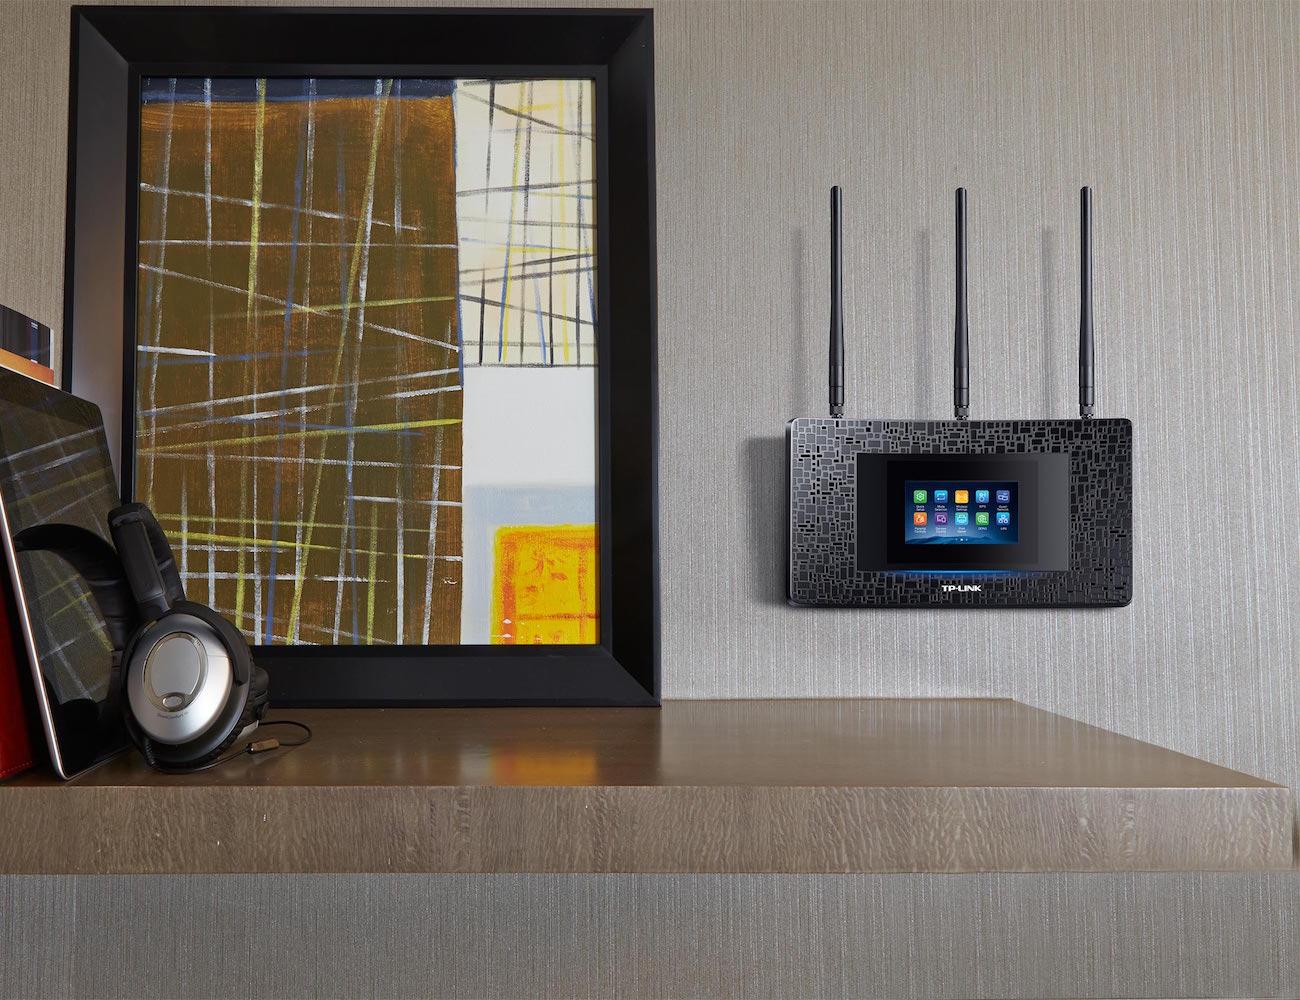 TP-LINK AC1900 Touchscreen Wi-Fi Range Extender